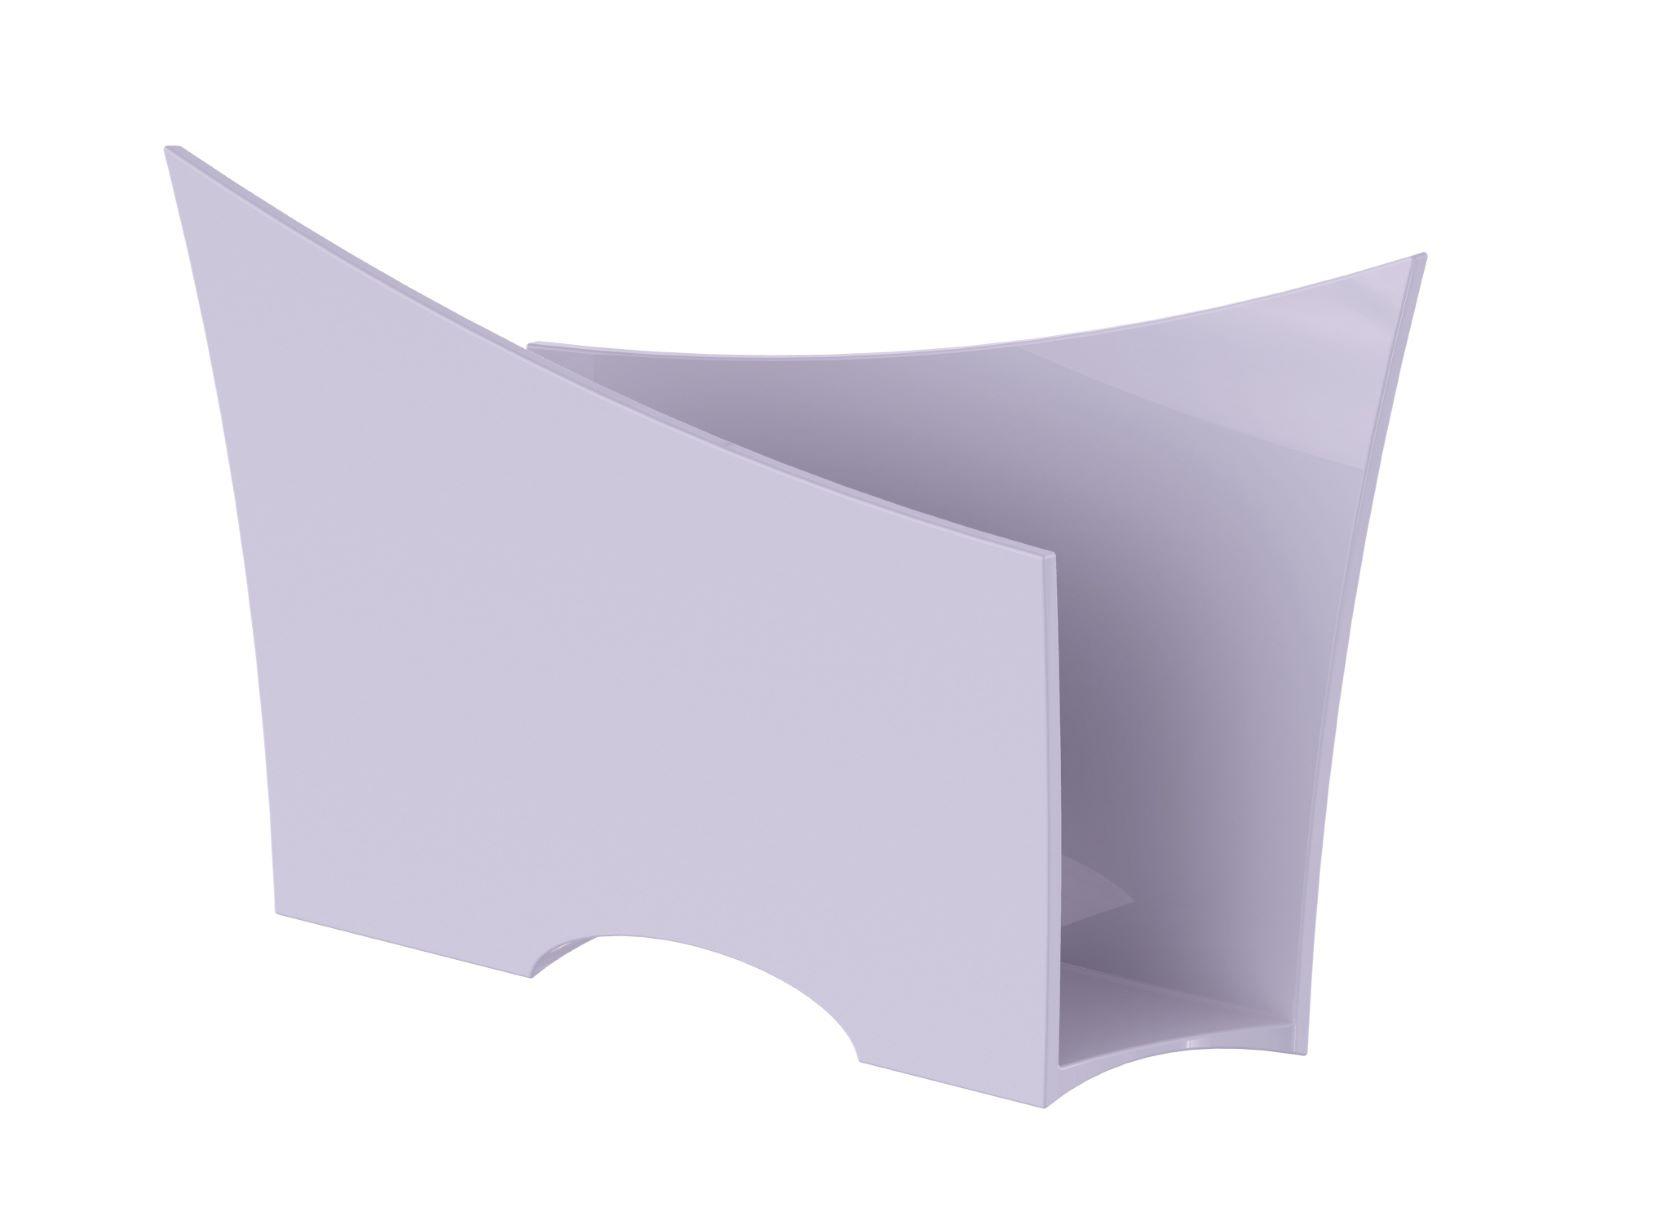 Porta Guardanapo Quadrado Plástico UZ Utilidades Branco